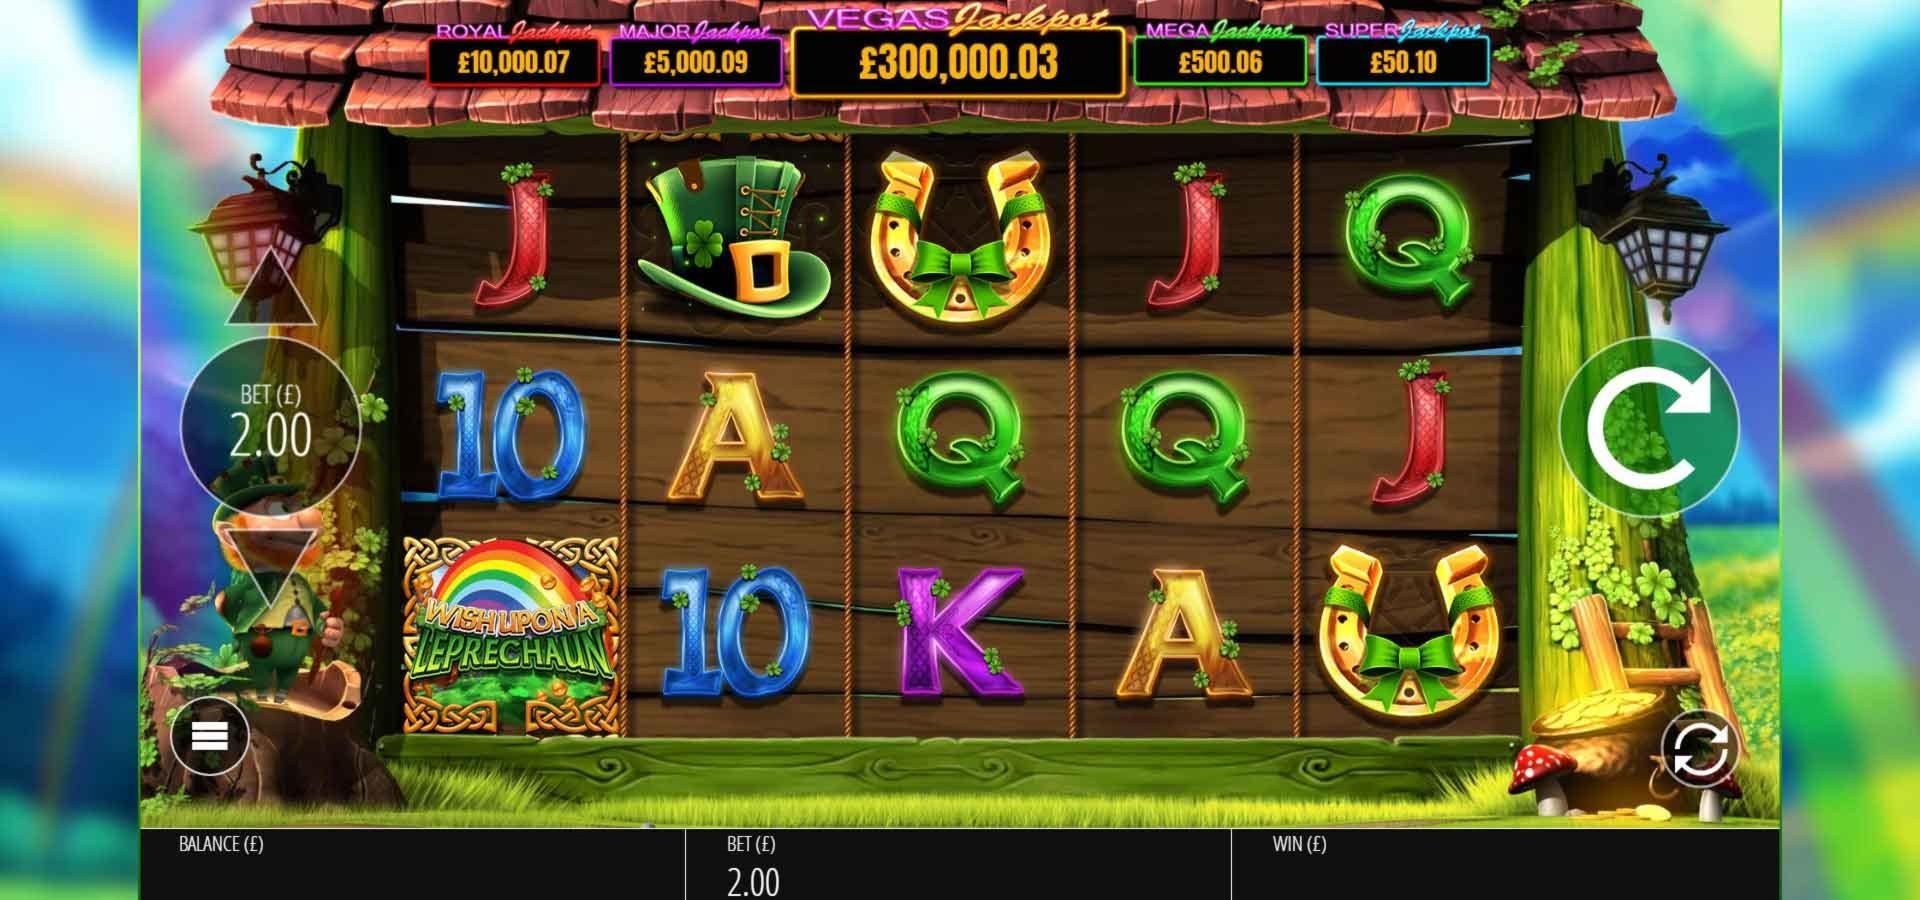 EURO 730 Mobile بطولة دورة مجانية في Joy Casino